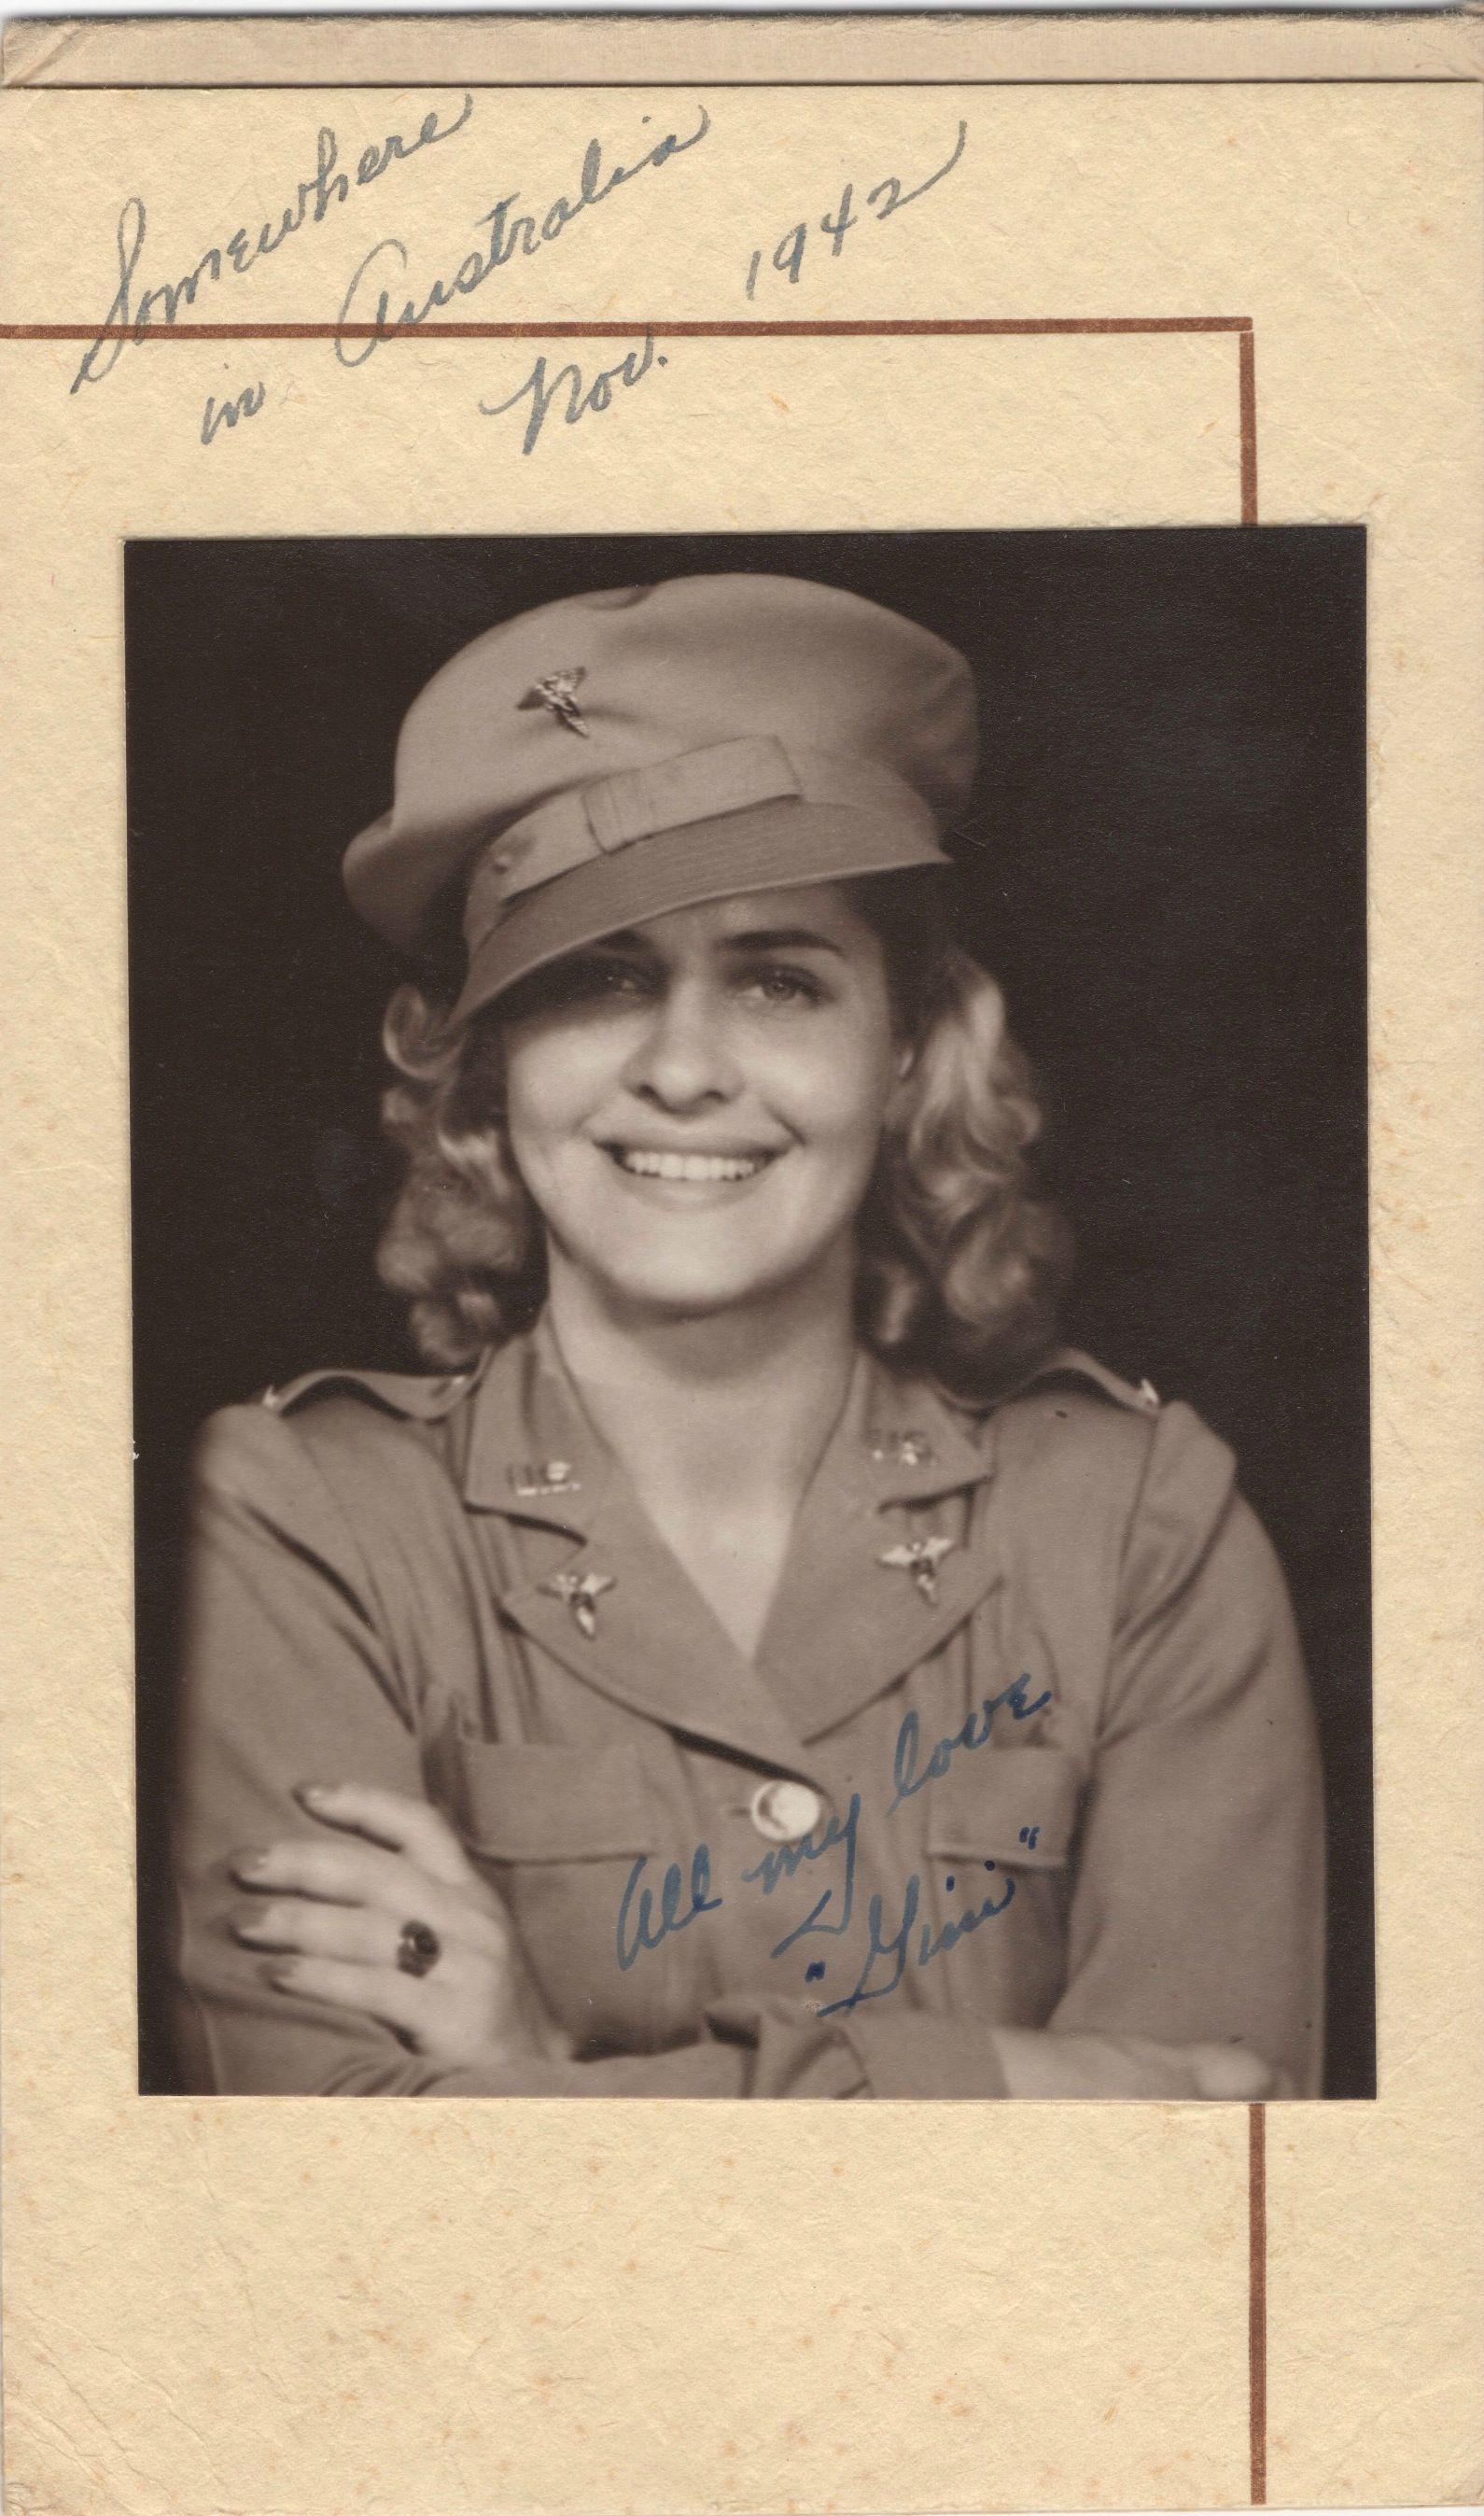 An American nurse in Australia (November 1942).